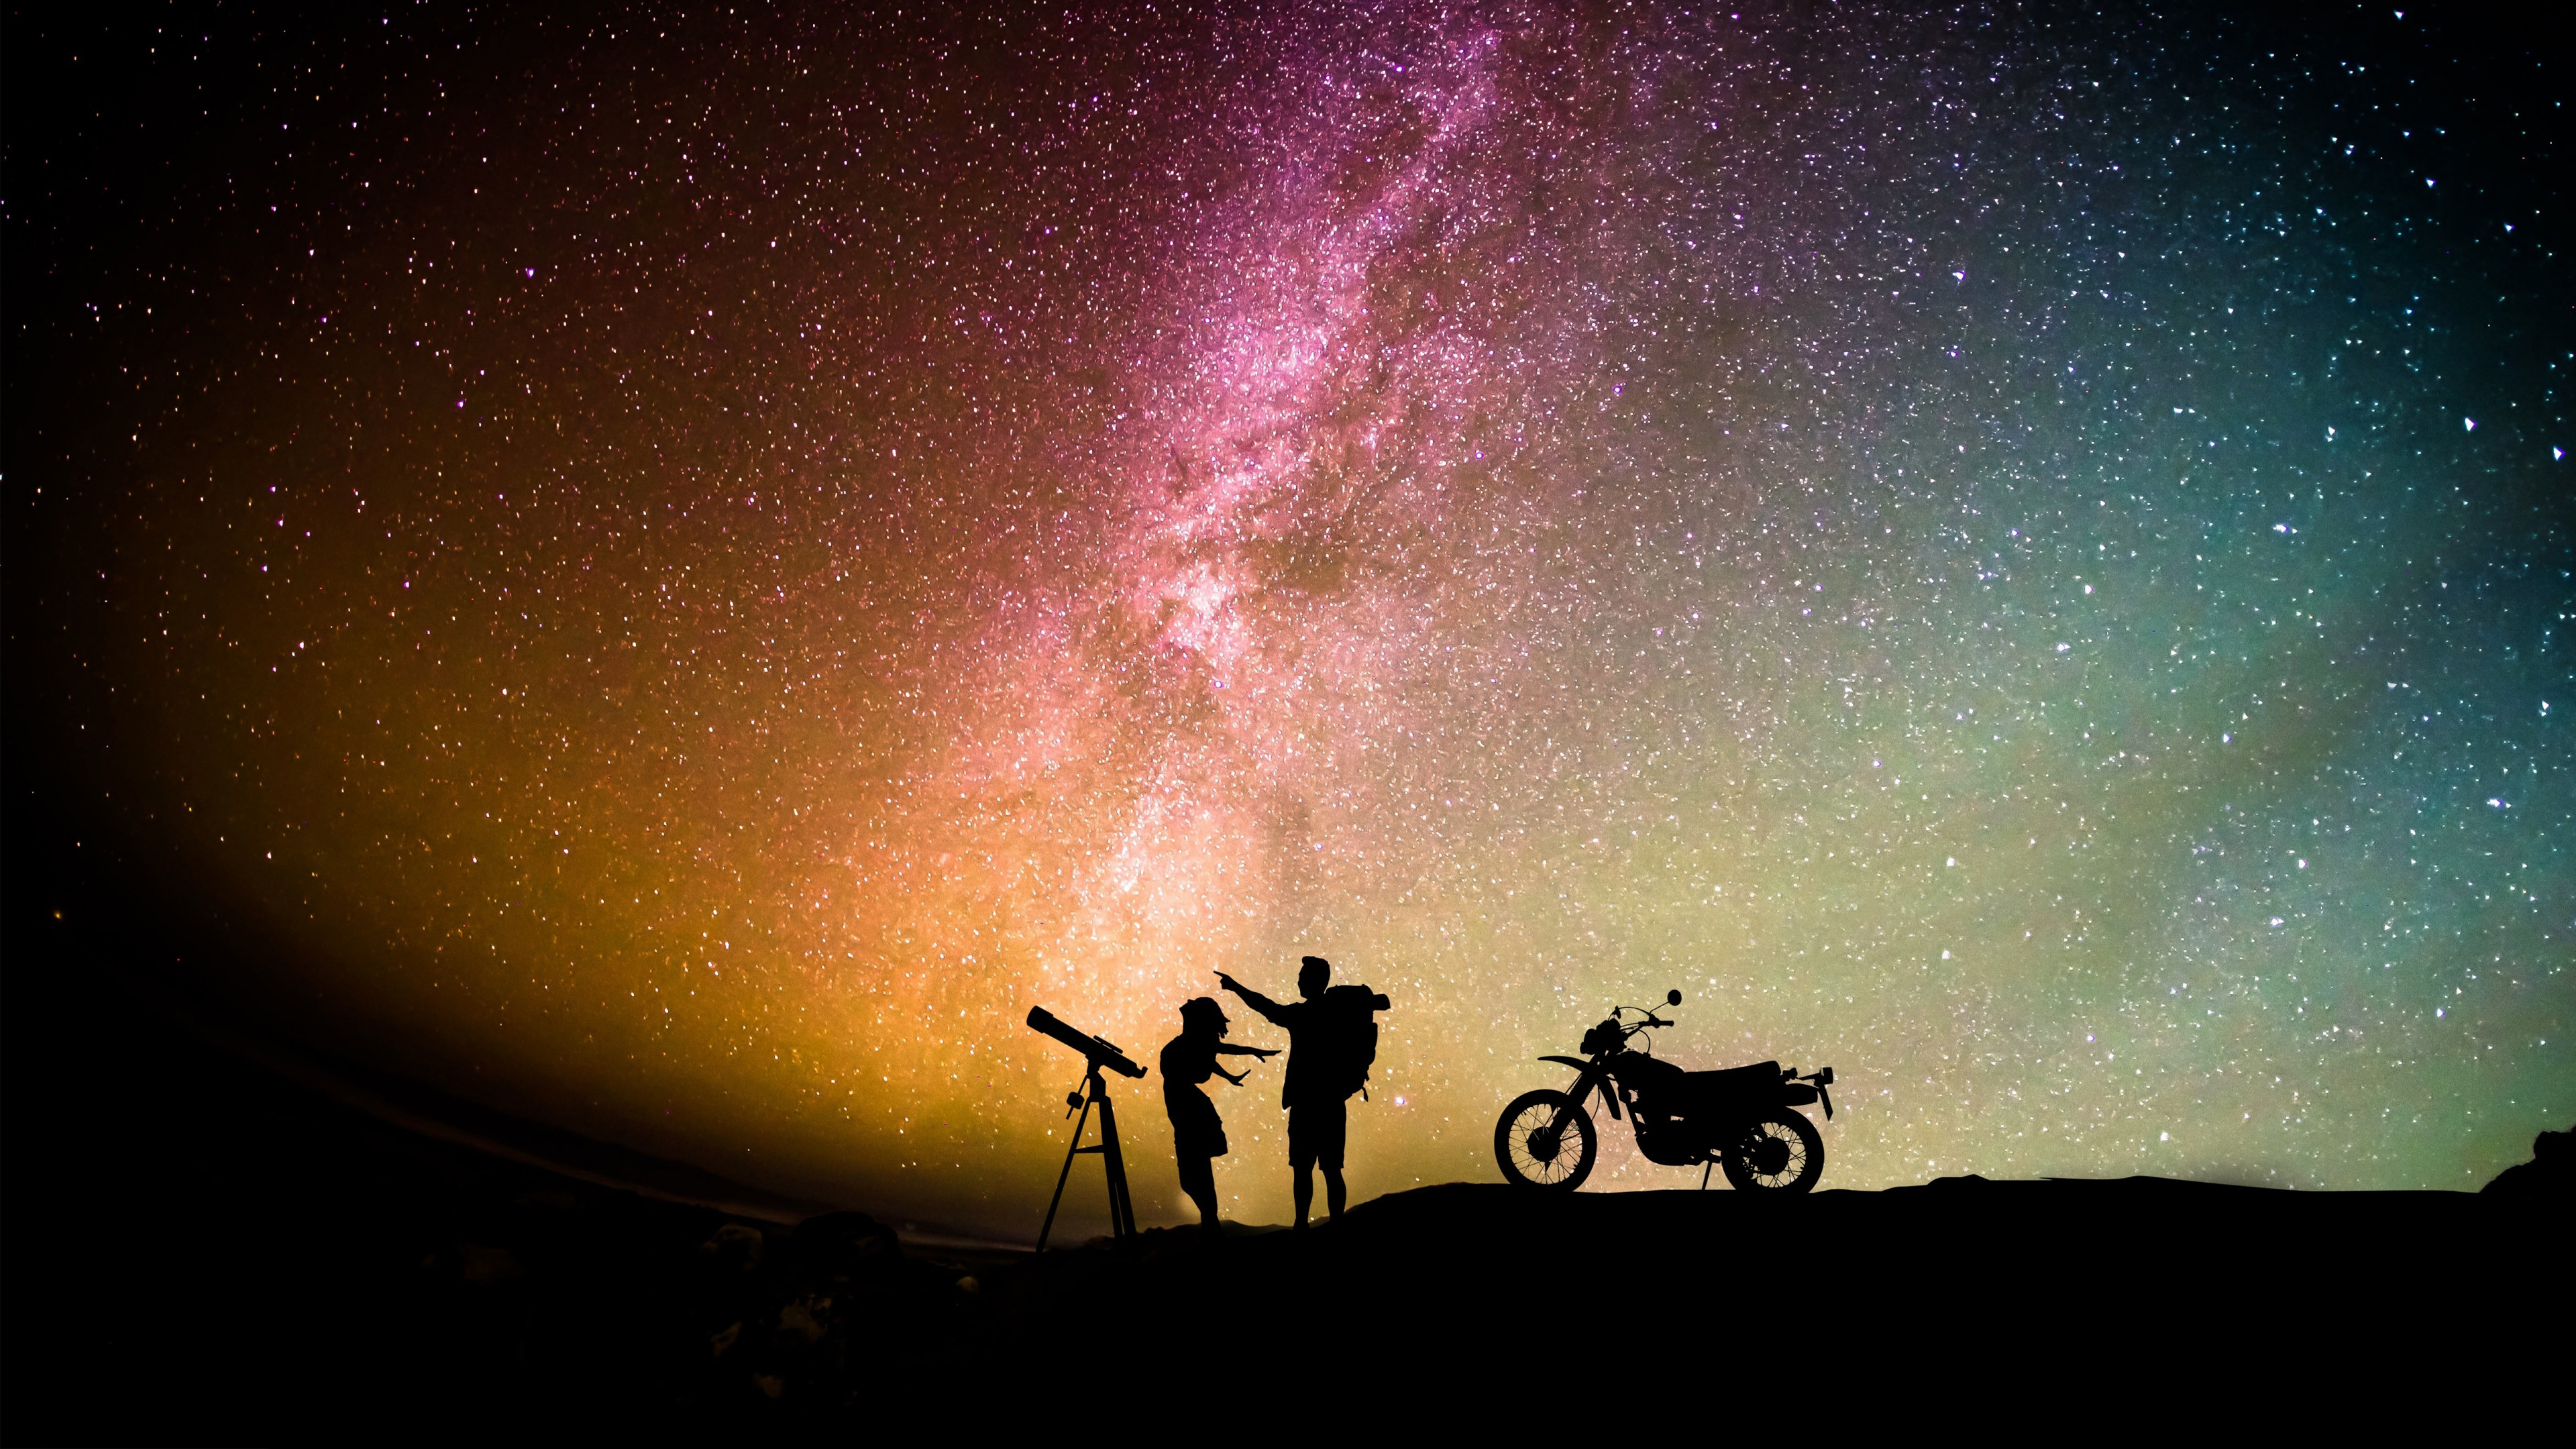 Love Romantic Couple Silhouette Starry Sky Wallpaper - Love Romantic Couple Background - HD Wallpaper